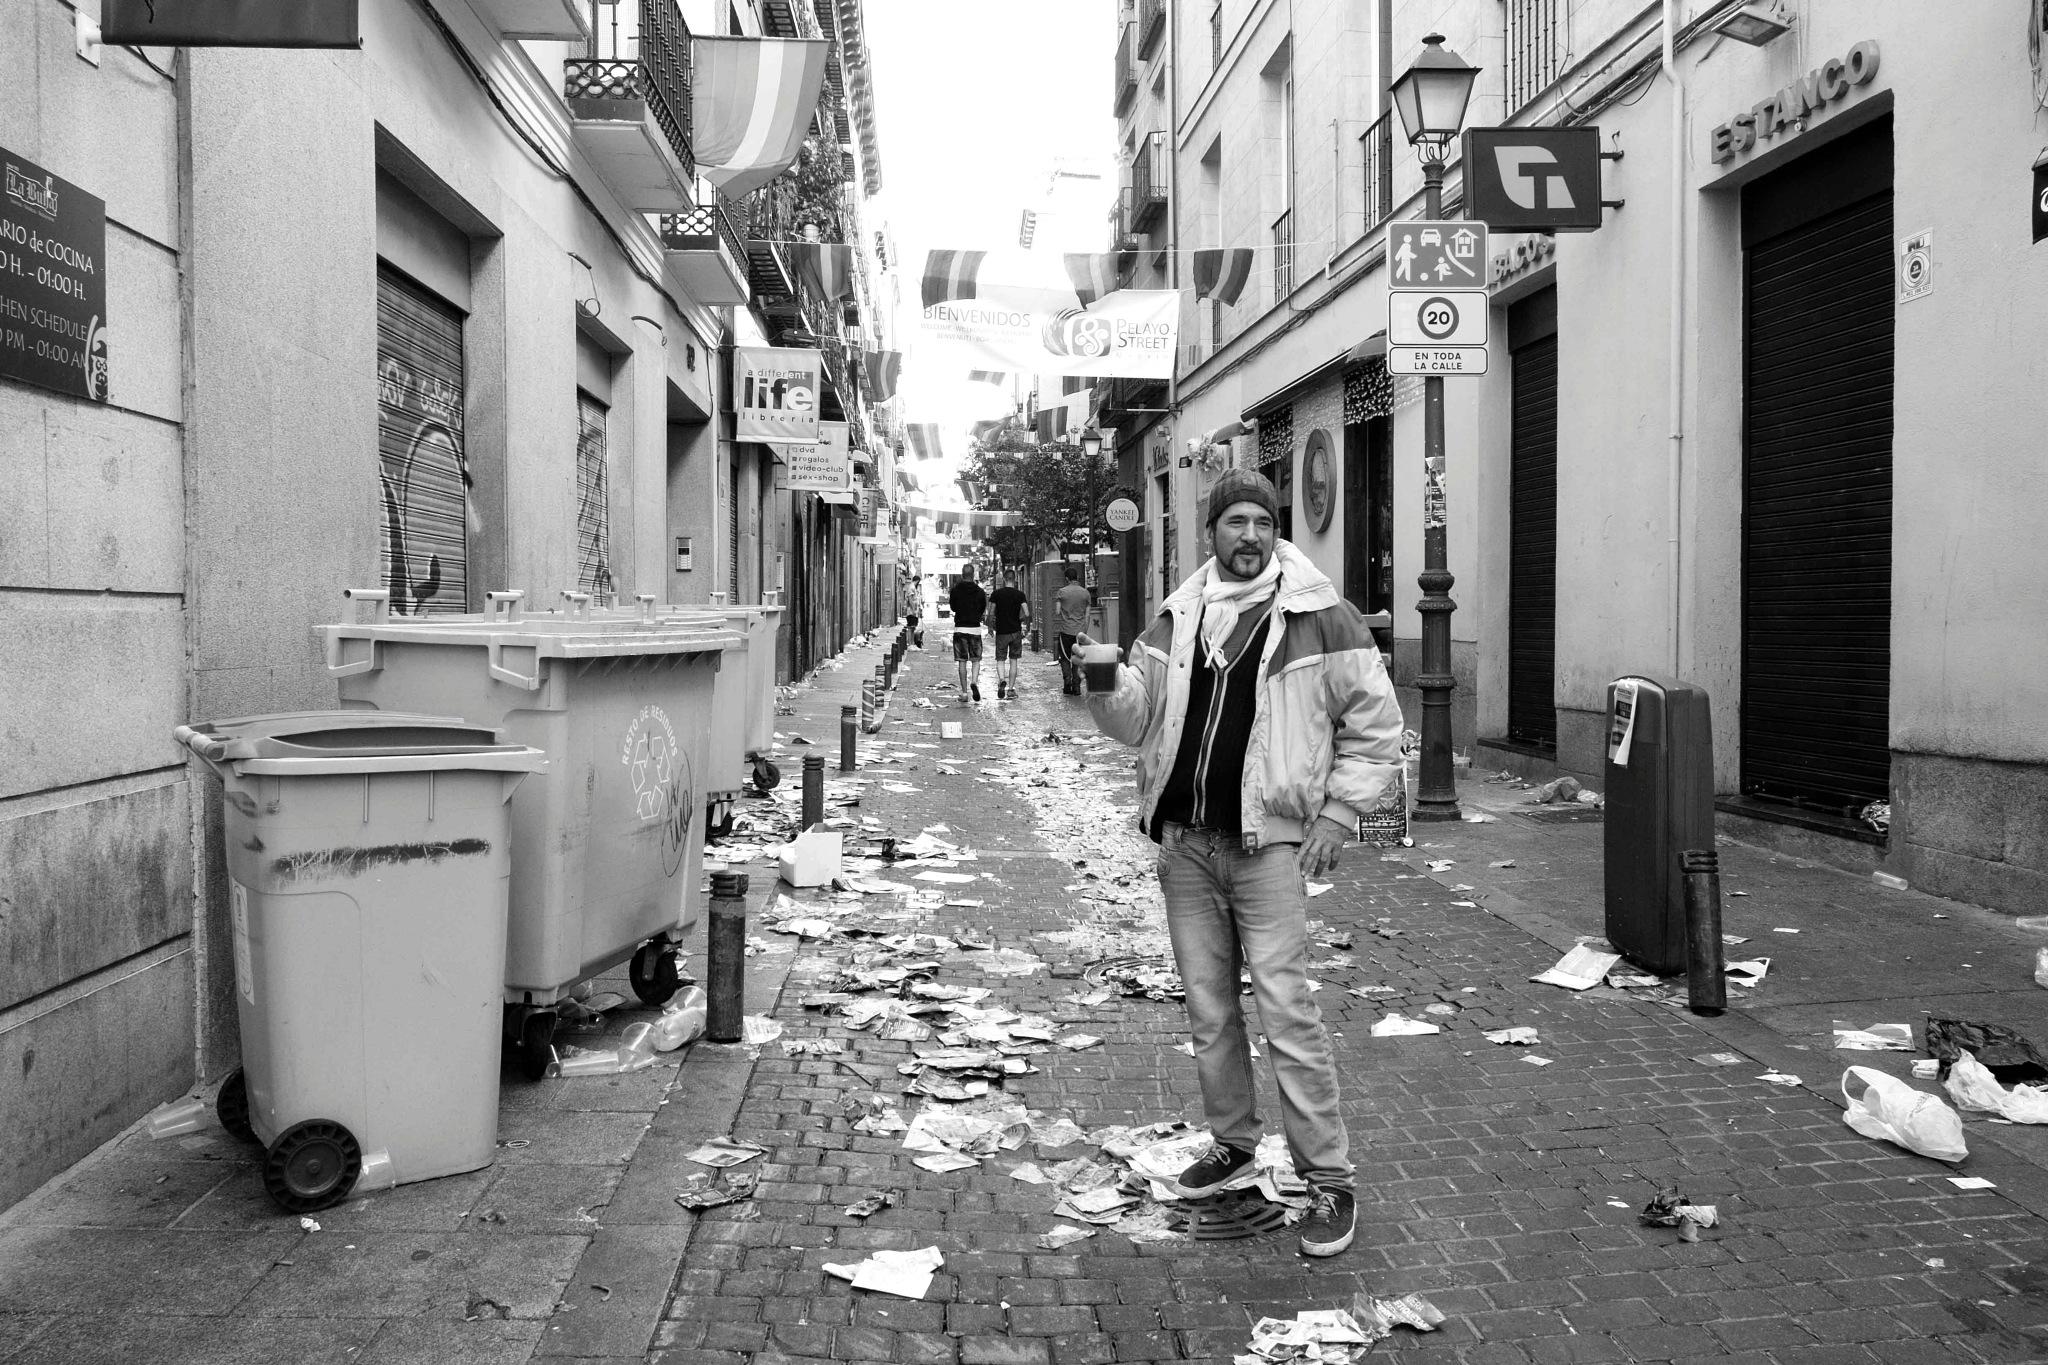 Trash (serie) by juliandelnogal